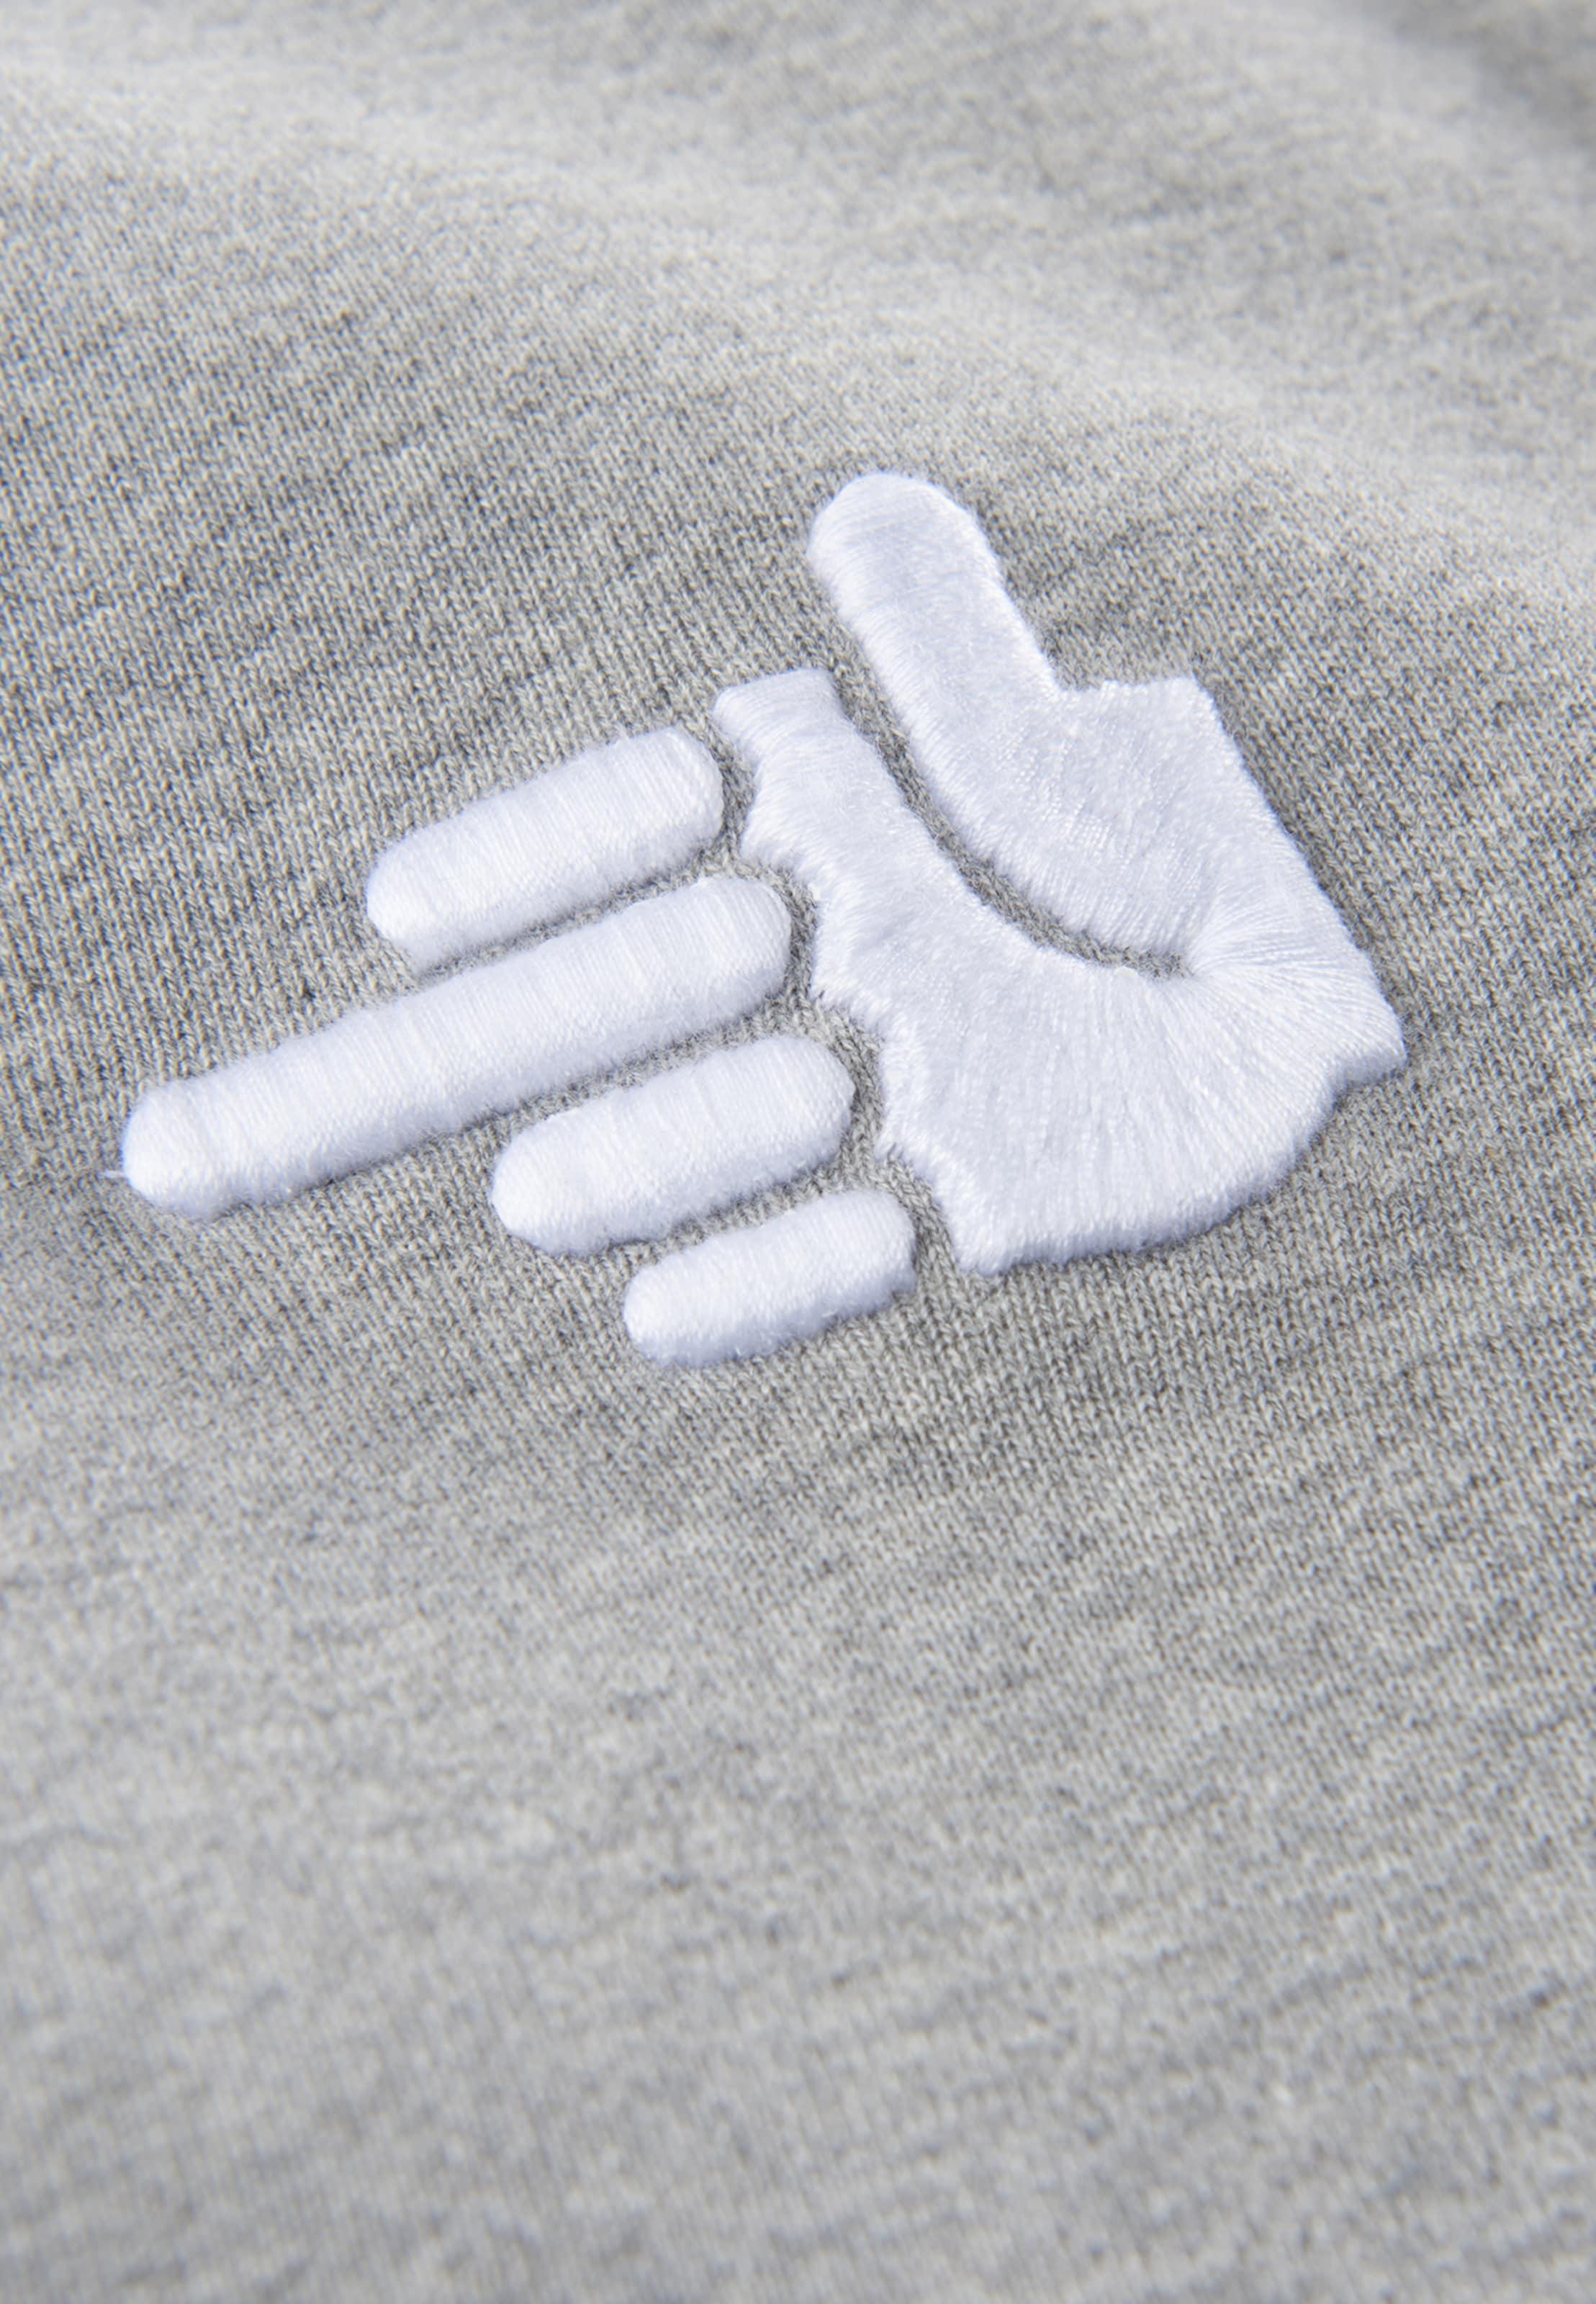 shirt A Gris 'be Sweat En Phyne Lover' ChinéBlanc SMVpUjqLzG